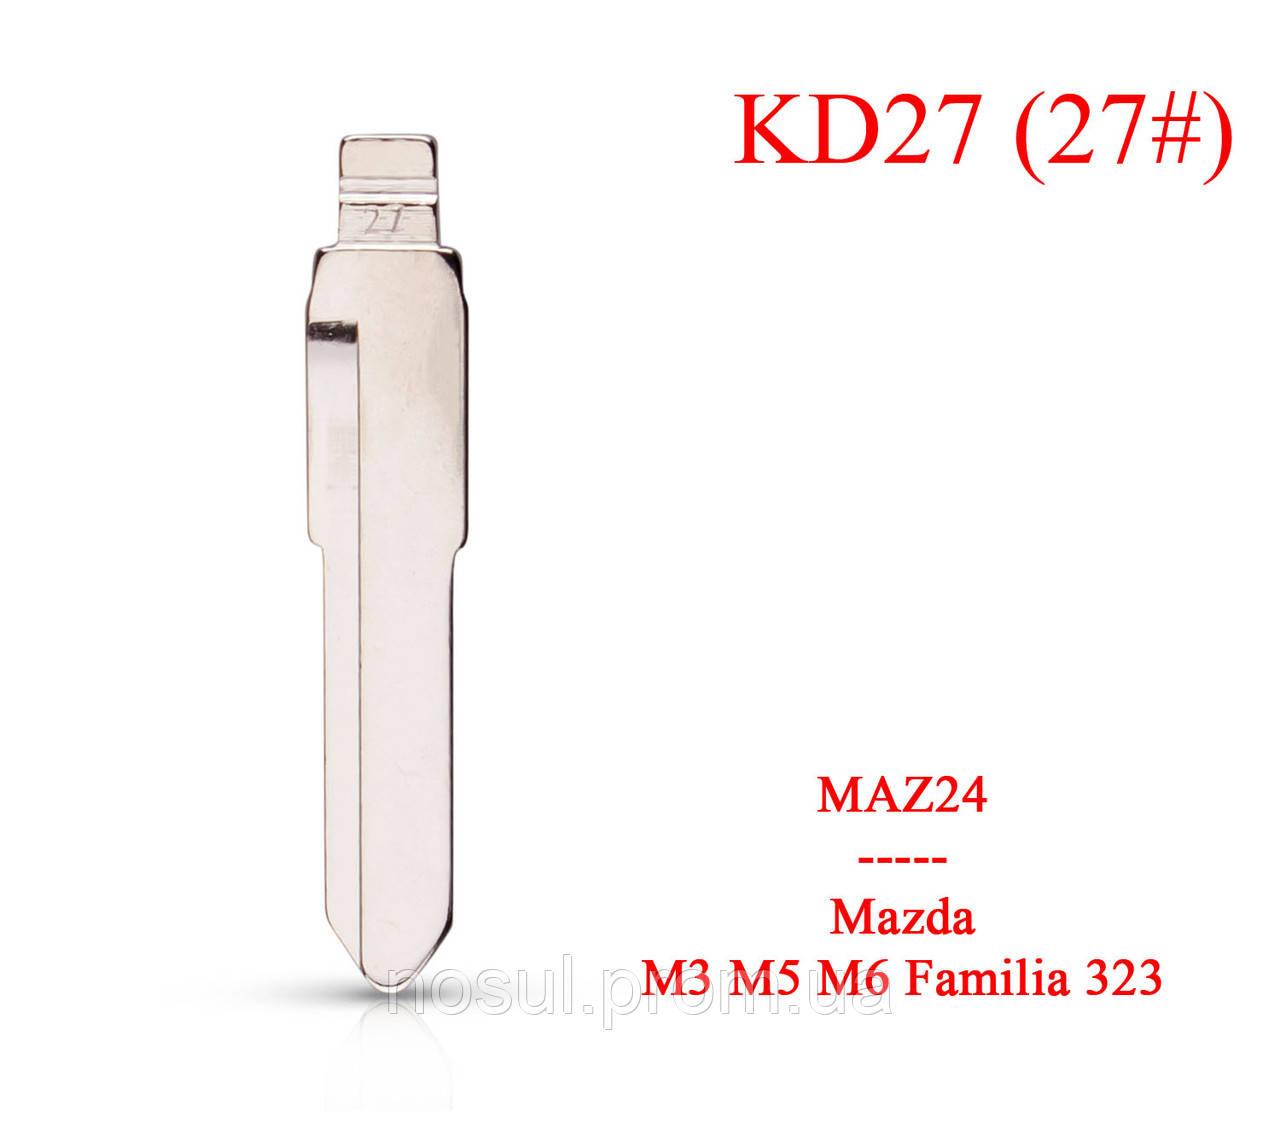 Keydiy жало выкидное лезвие ключа Mazda (MAZ24) № 27 KD 27# M3 M5 M6 M7 Familia 323